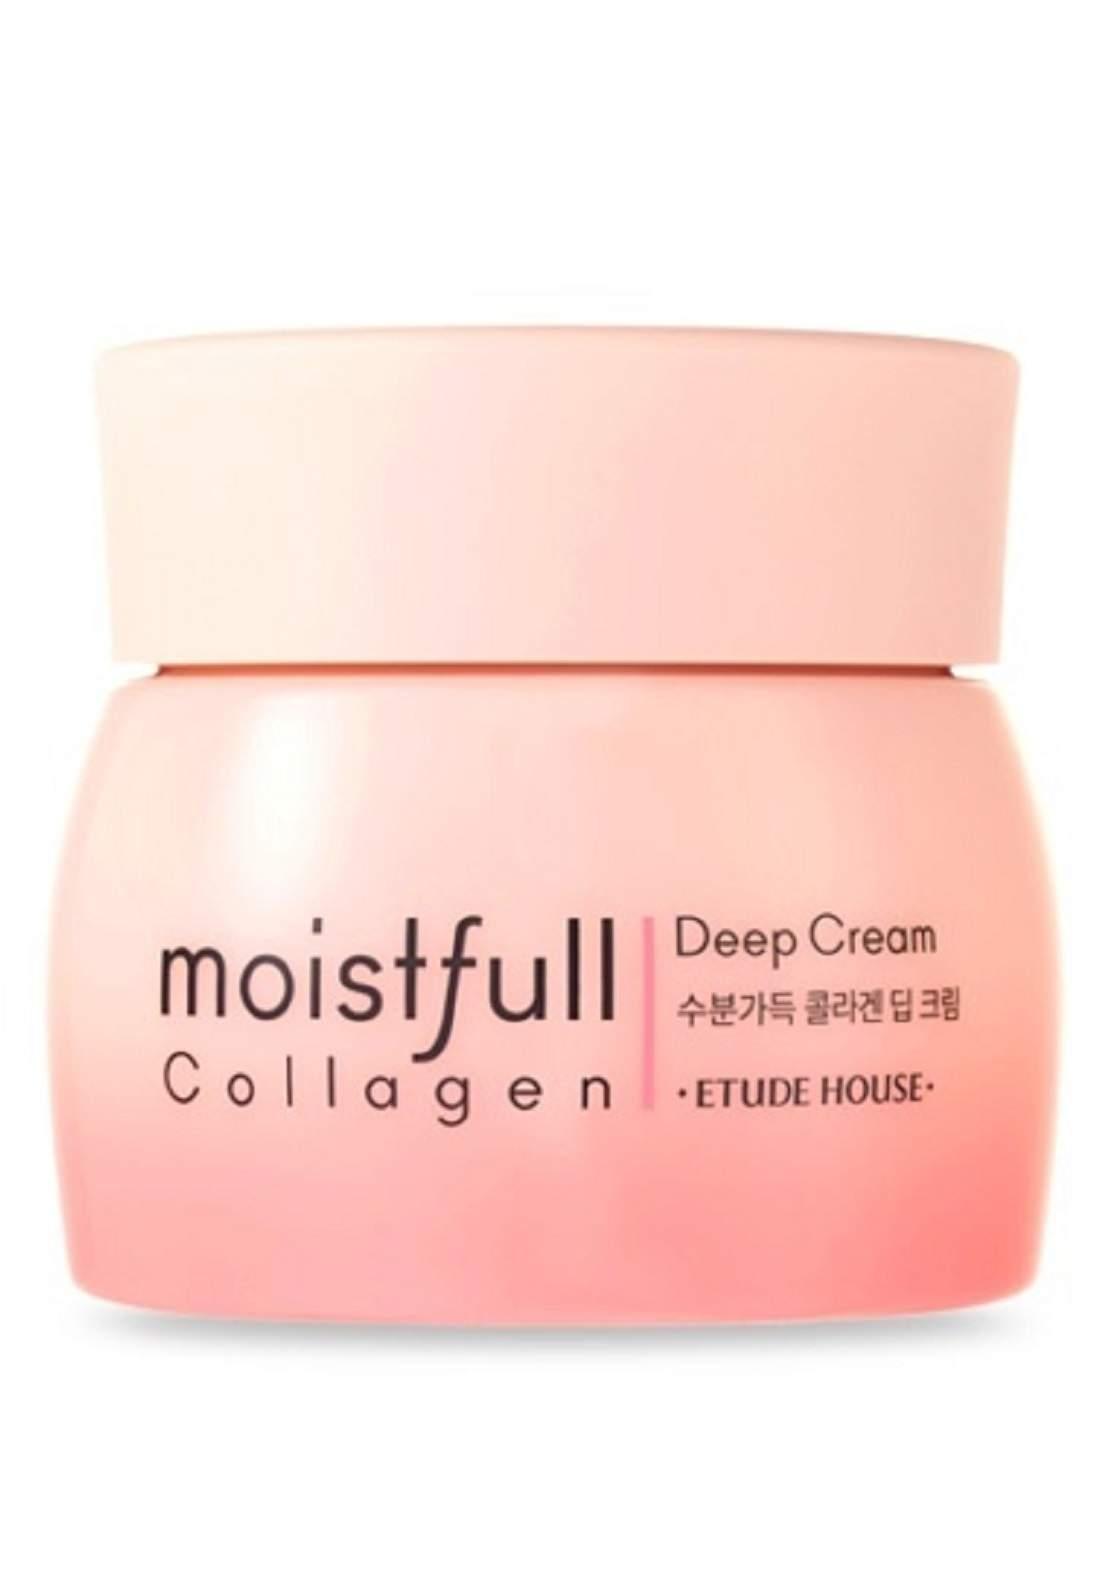 Etude House Deep Collagen Cream كريم الكولاجين العميق